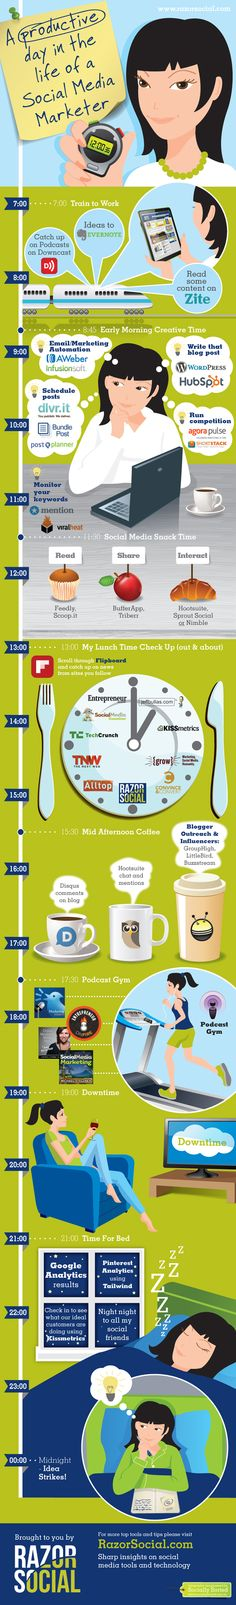 Social Media Marketing 21 Ways to Dominate Social Media Marketing #socialmedia #qca